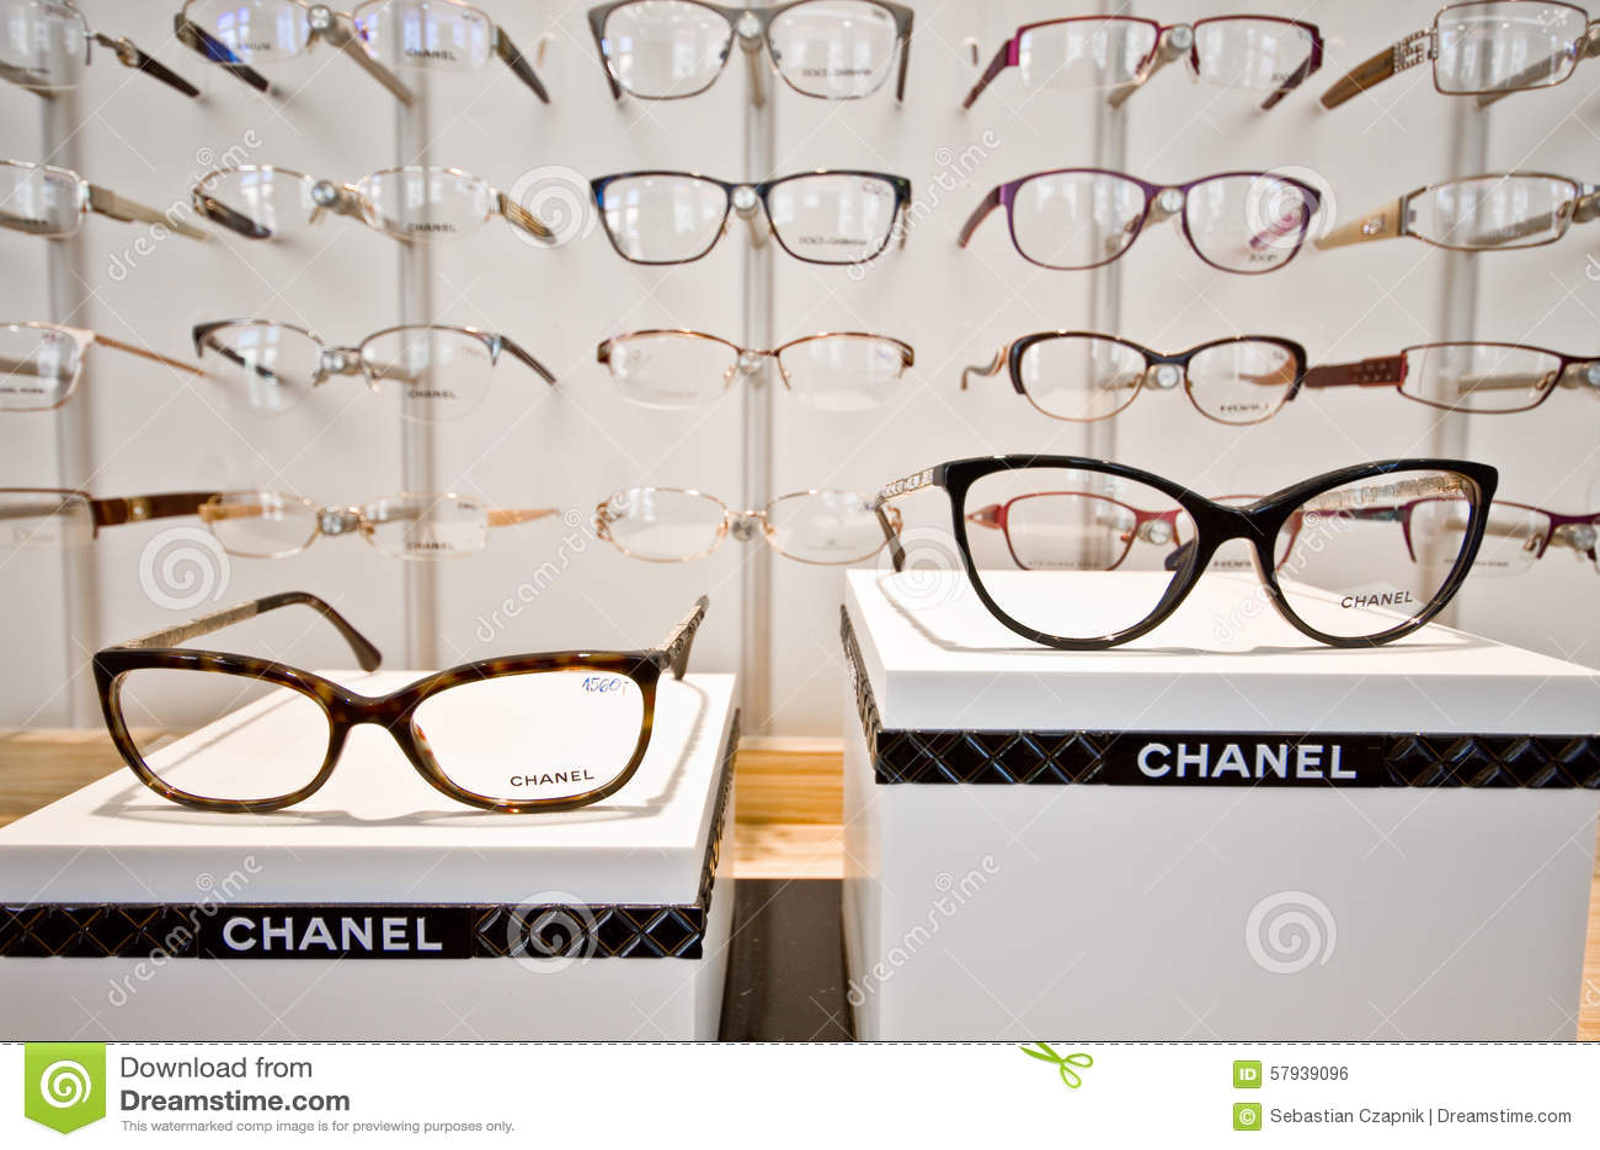 Eyeglasses display - Chanel Eyeglass Frames Editorial Photo